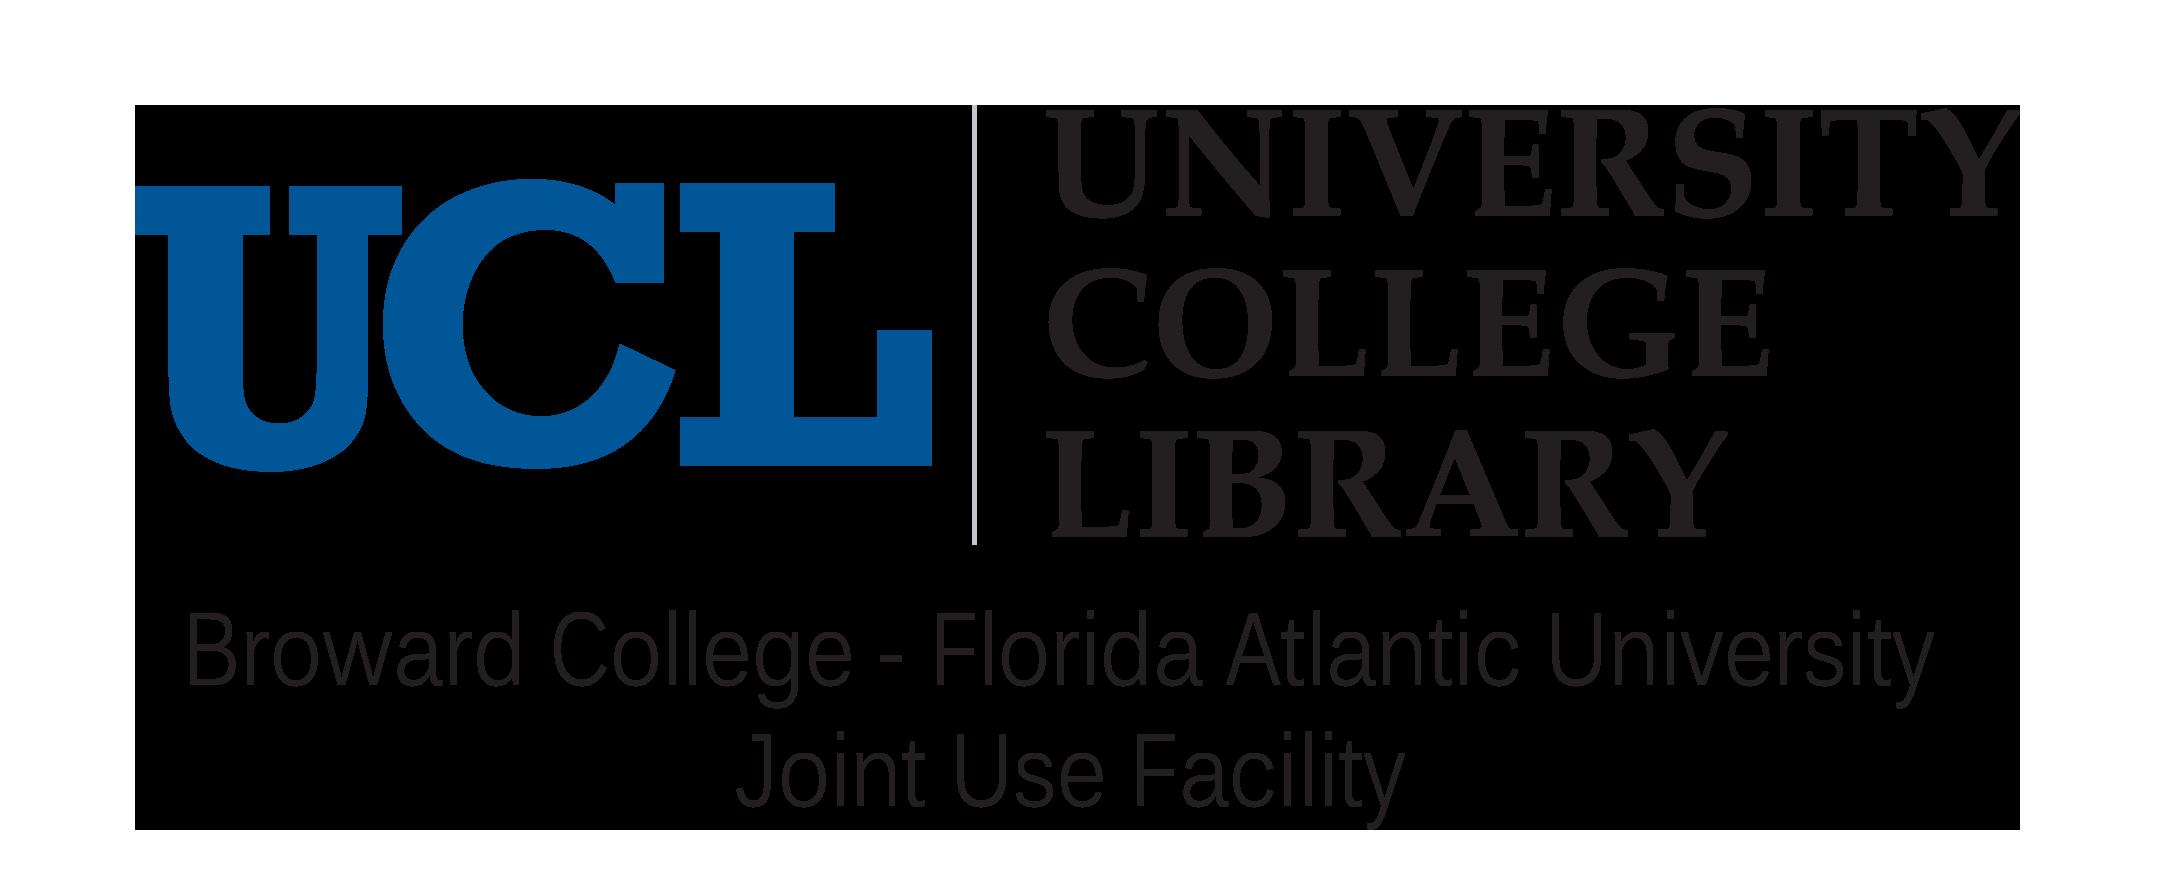 University College Library logo